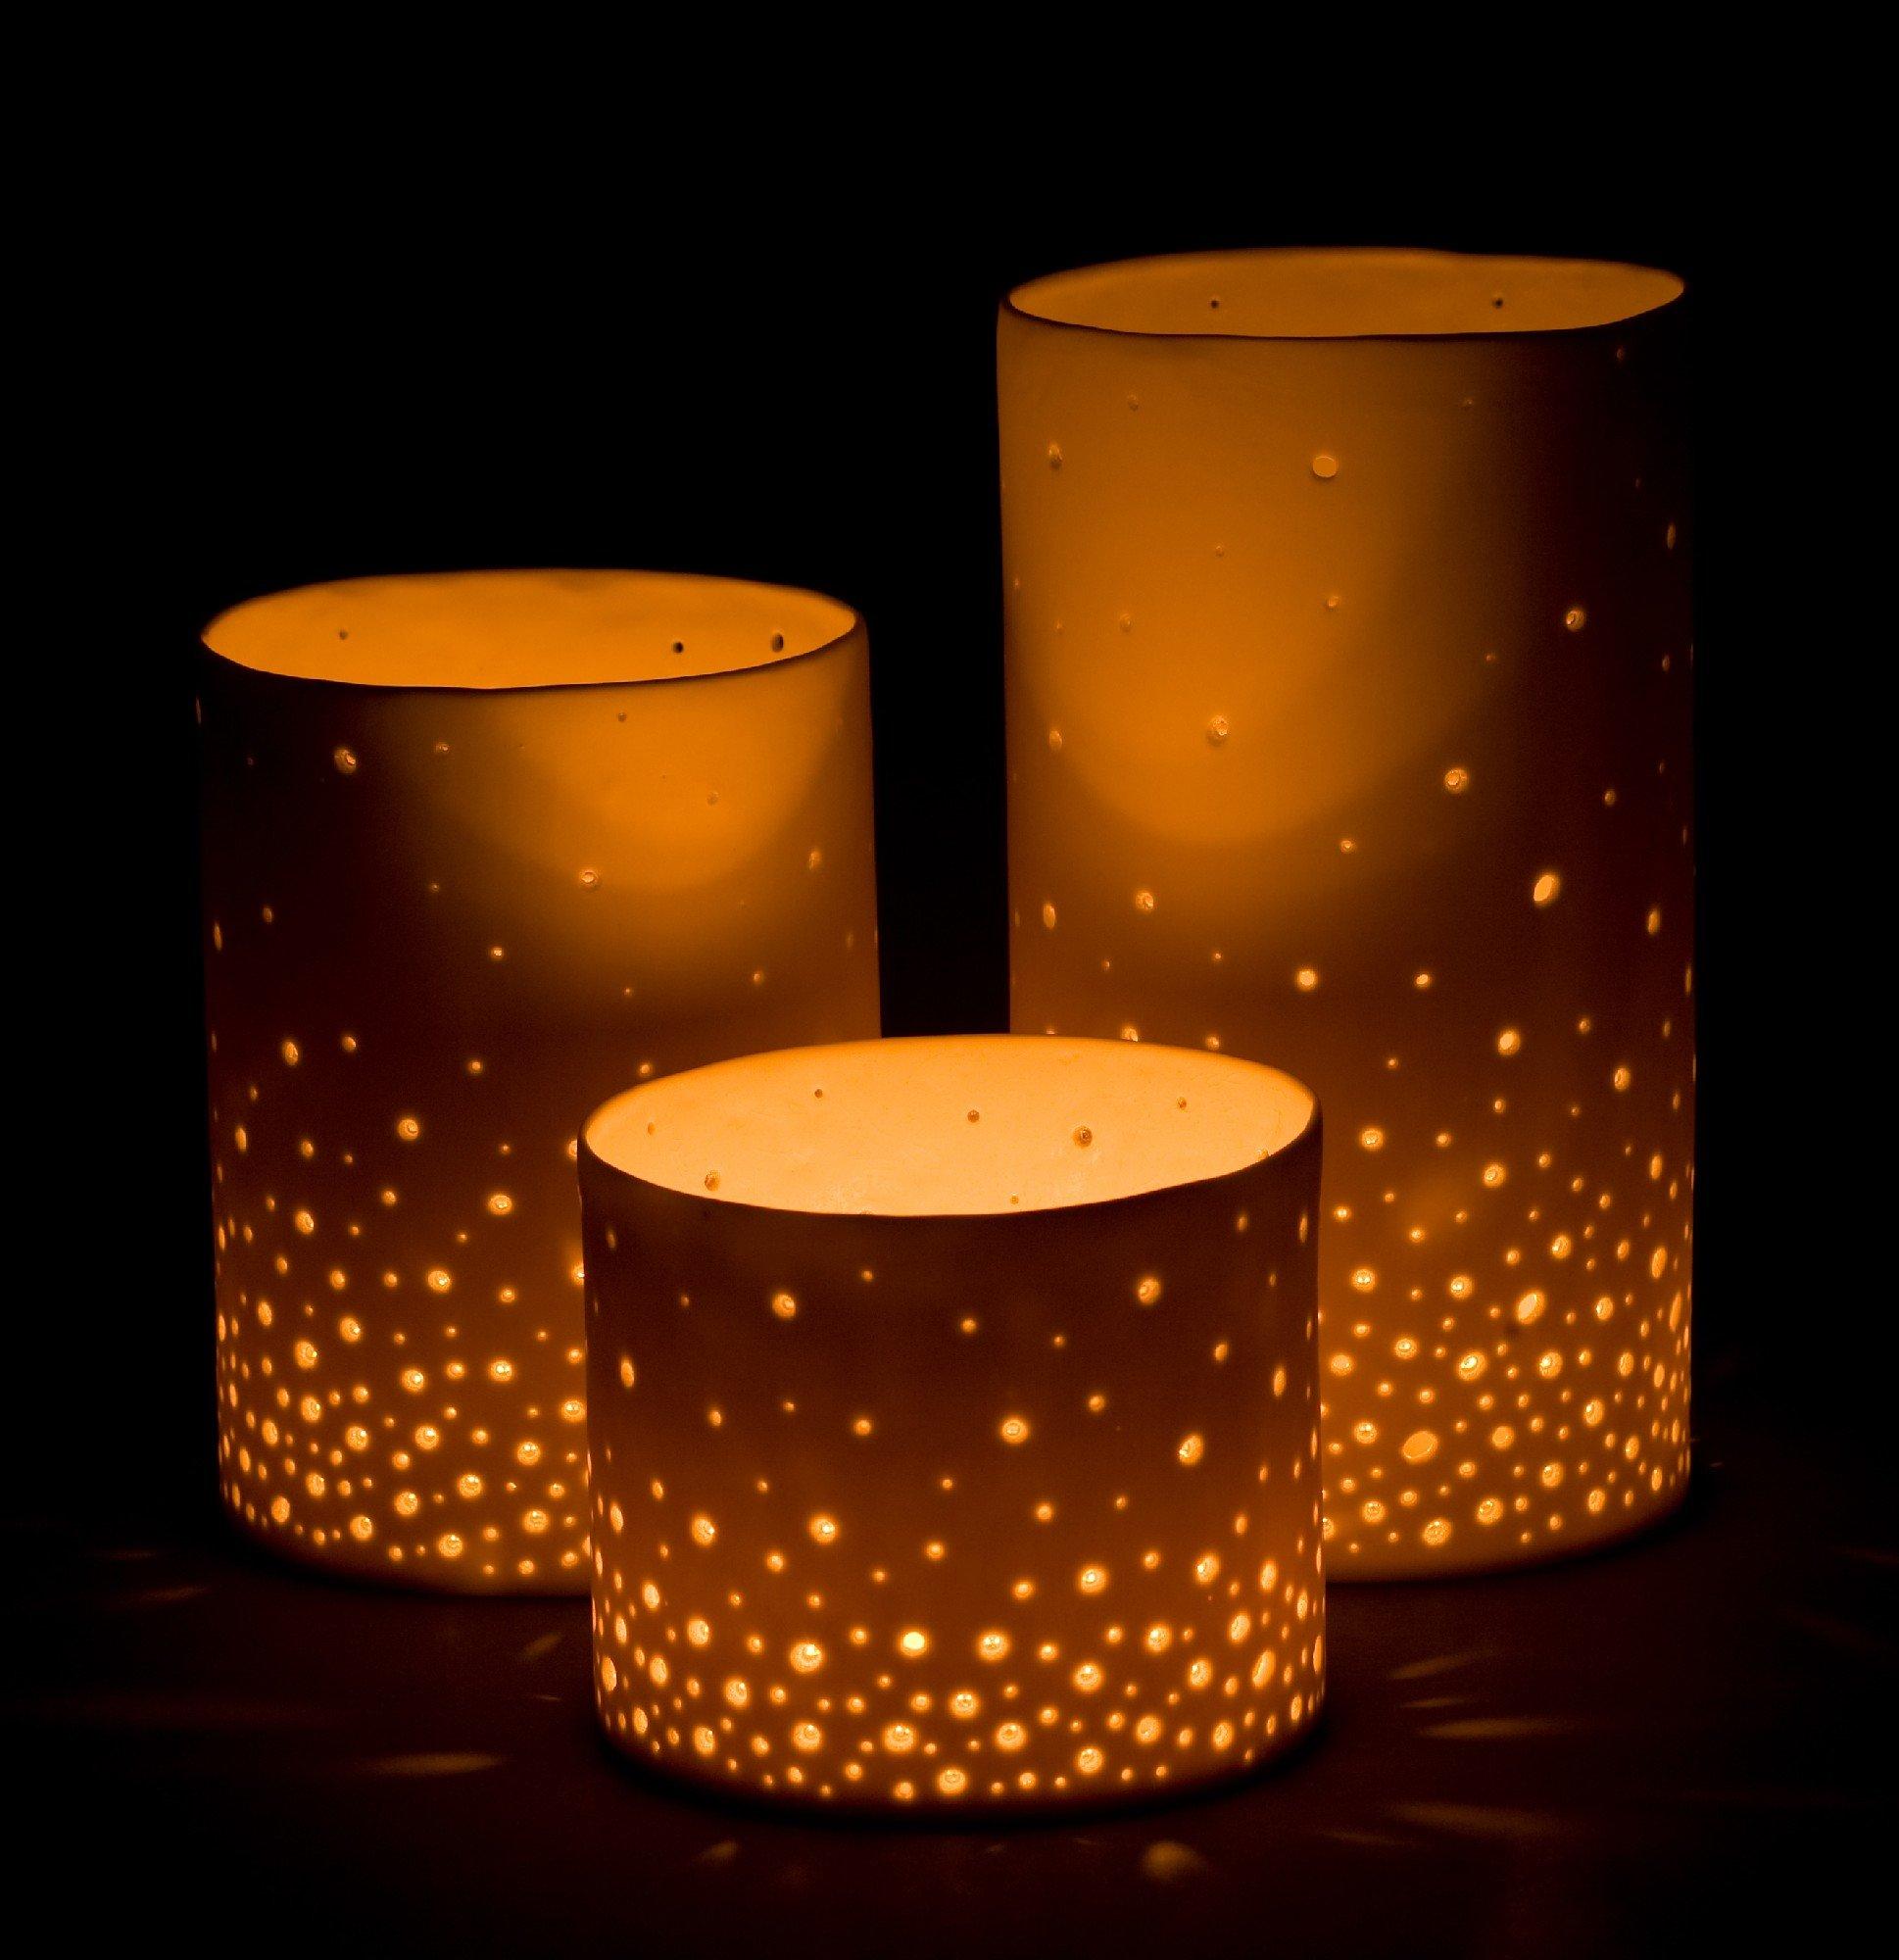 Starry Sky Luminaries By Tabbatha Henry Ceramic Candleholders Artful Home